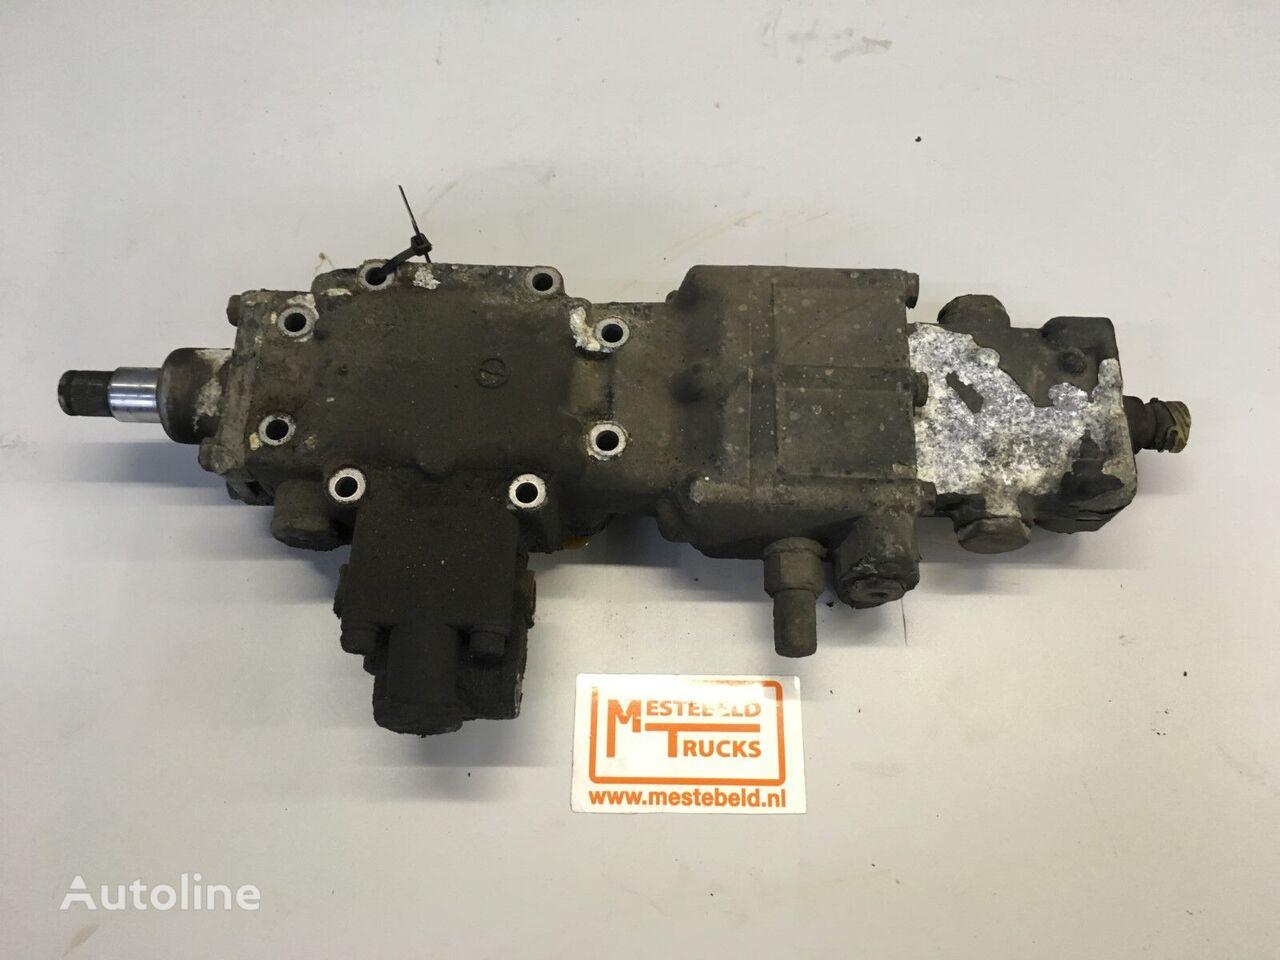 Schakelsysteem MAN (81.32103-0148) other transmission spare part for MAN truck